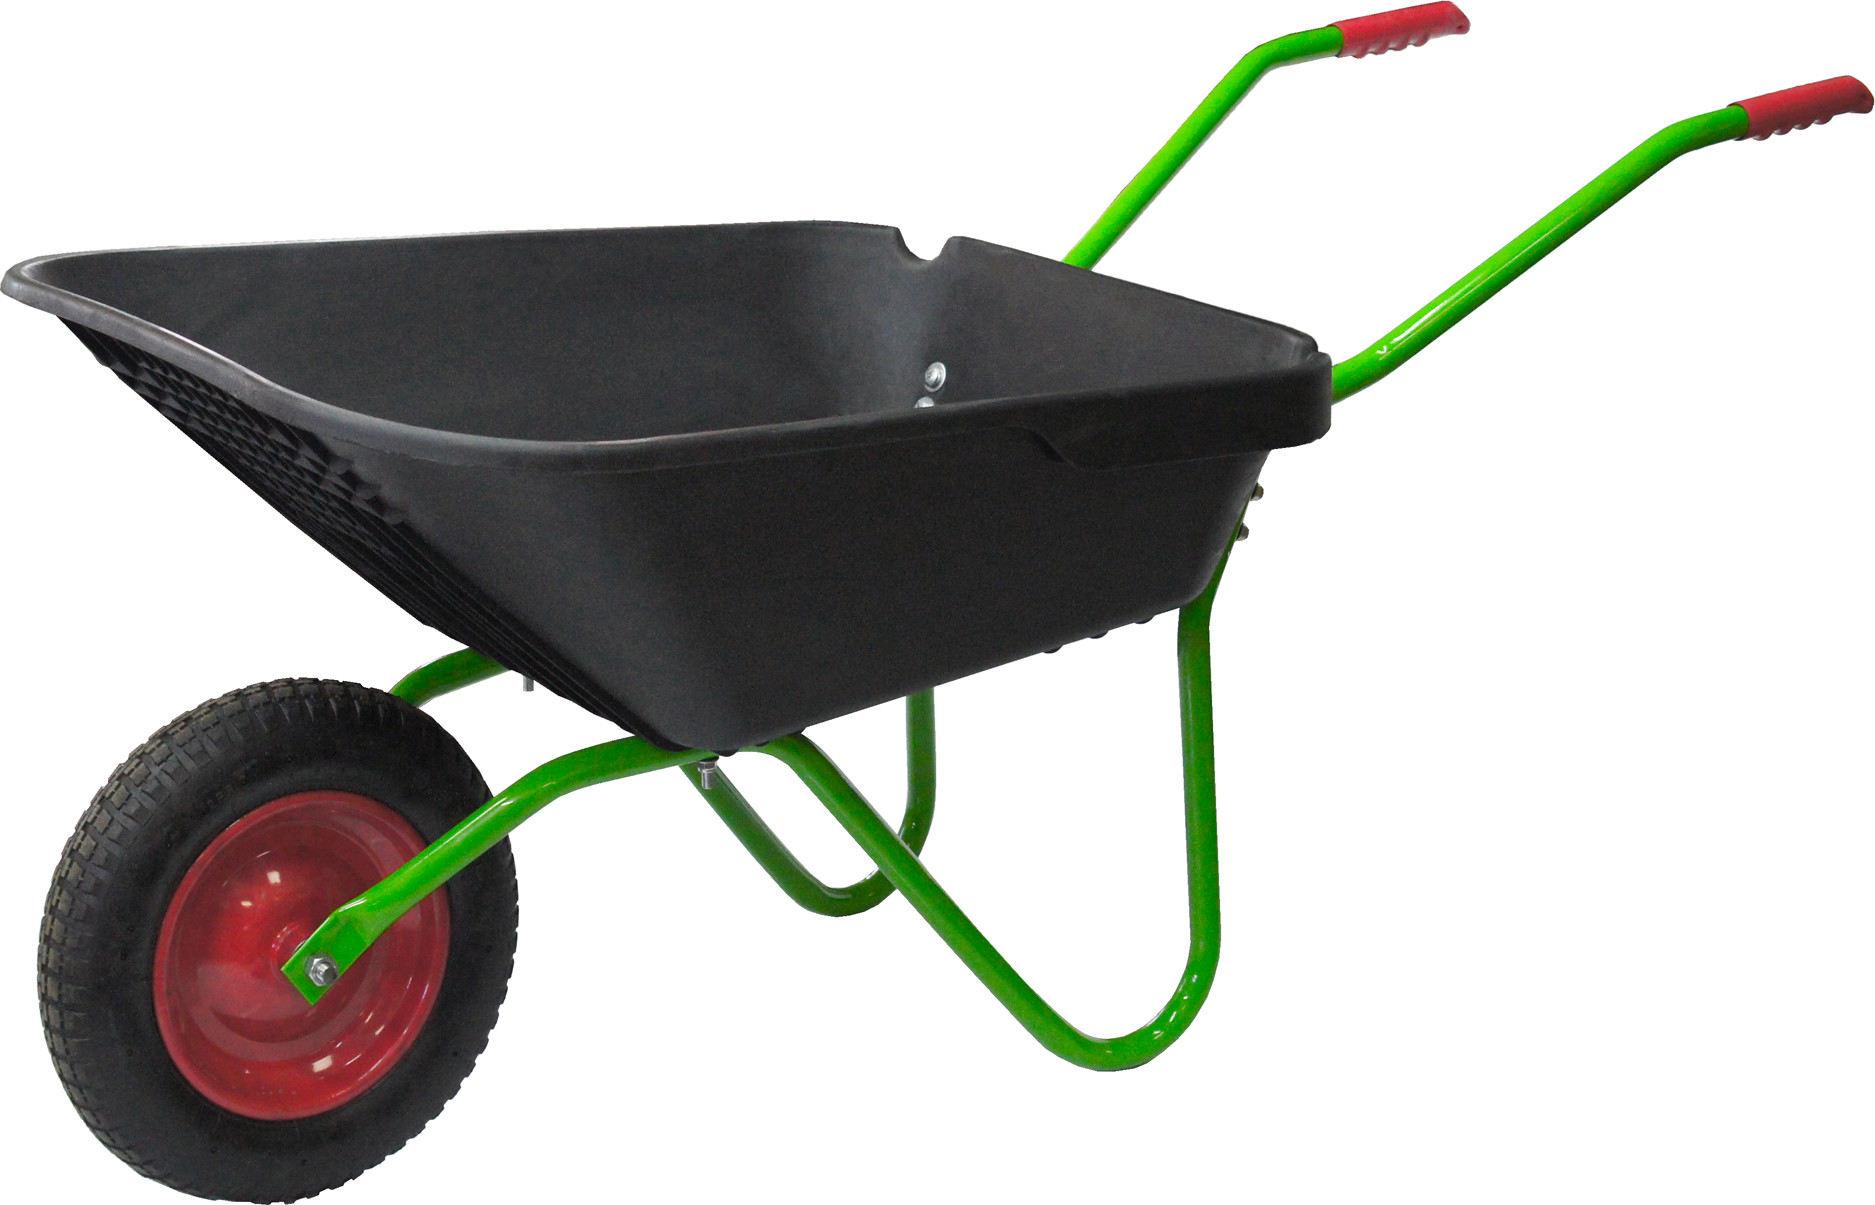 Тачка садово-строительная 175 кг90 л «СибрТех»